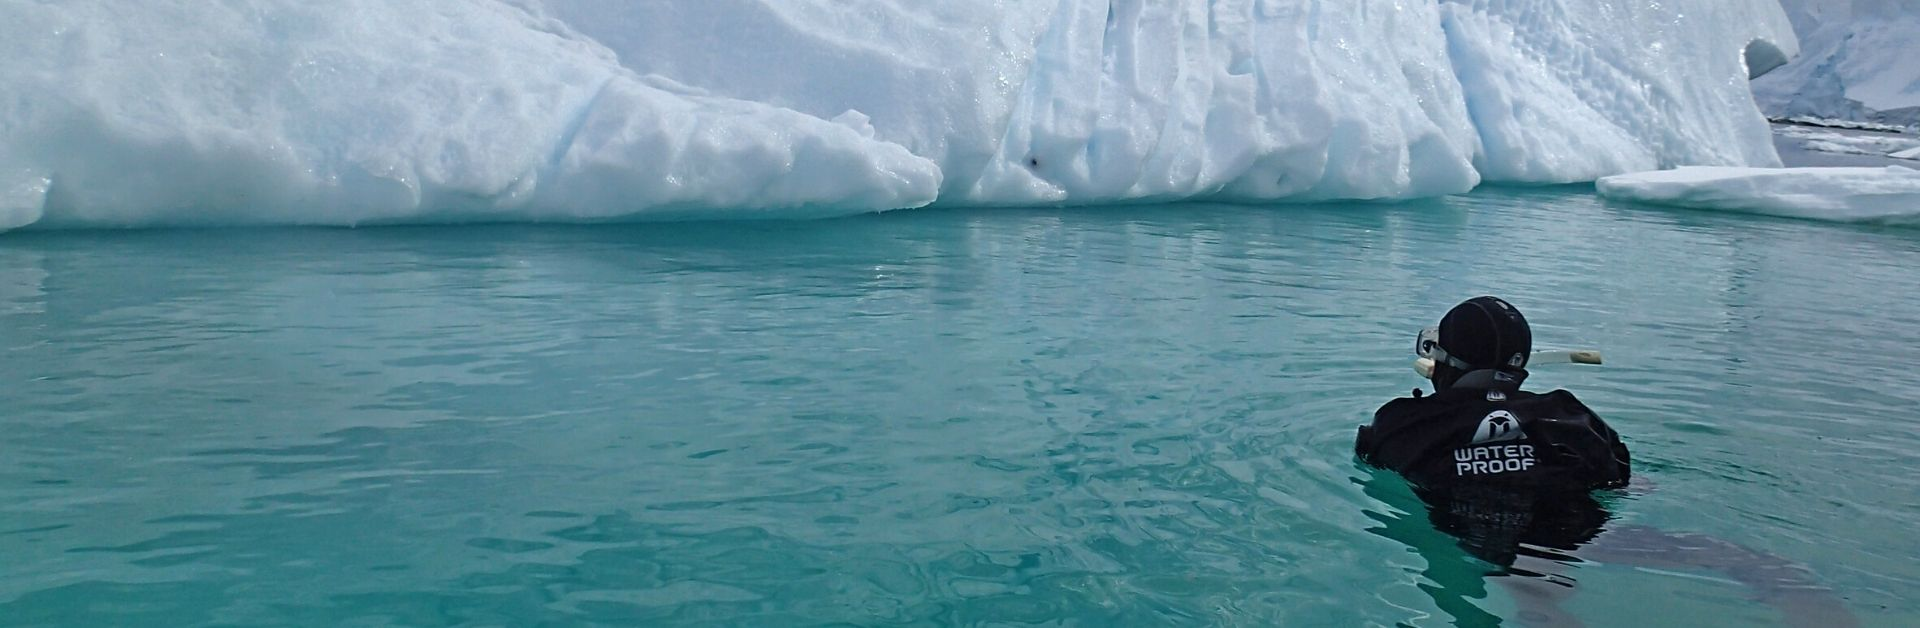 Polar snorkling Antarctica